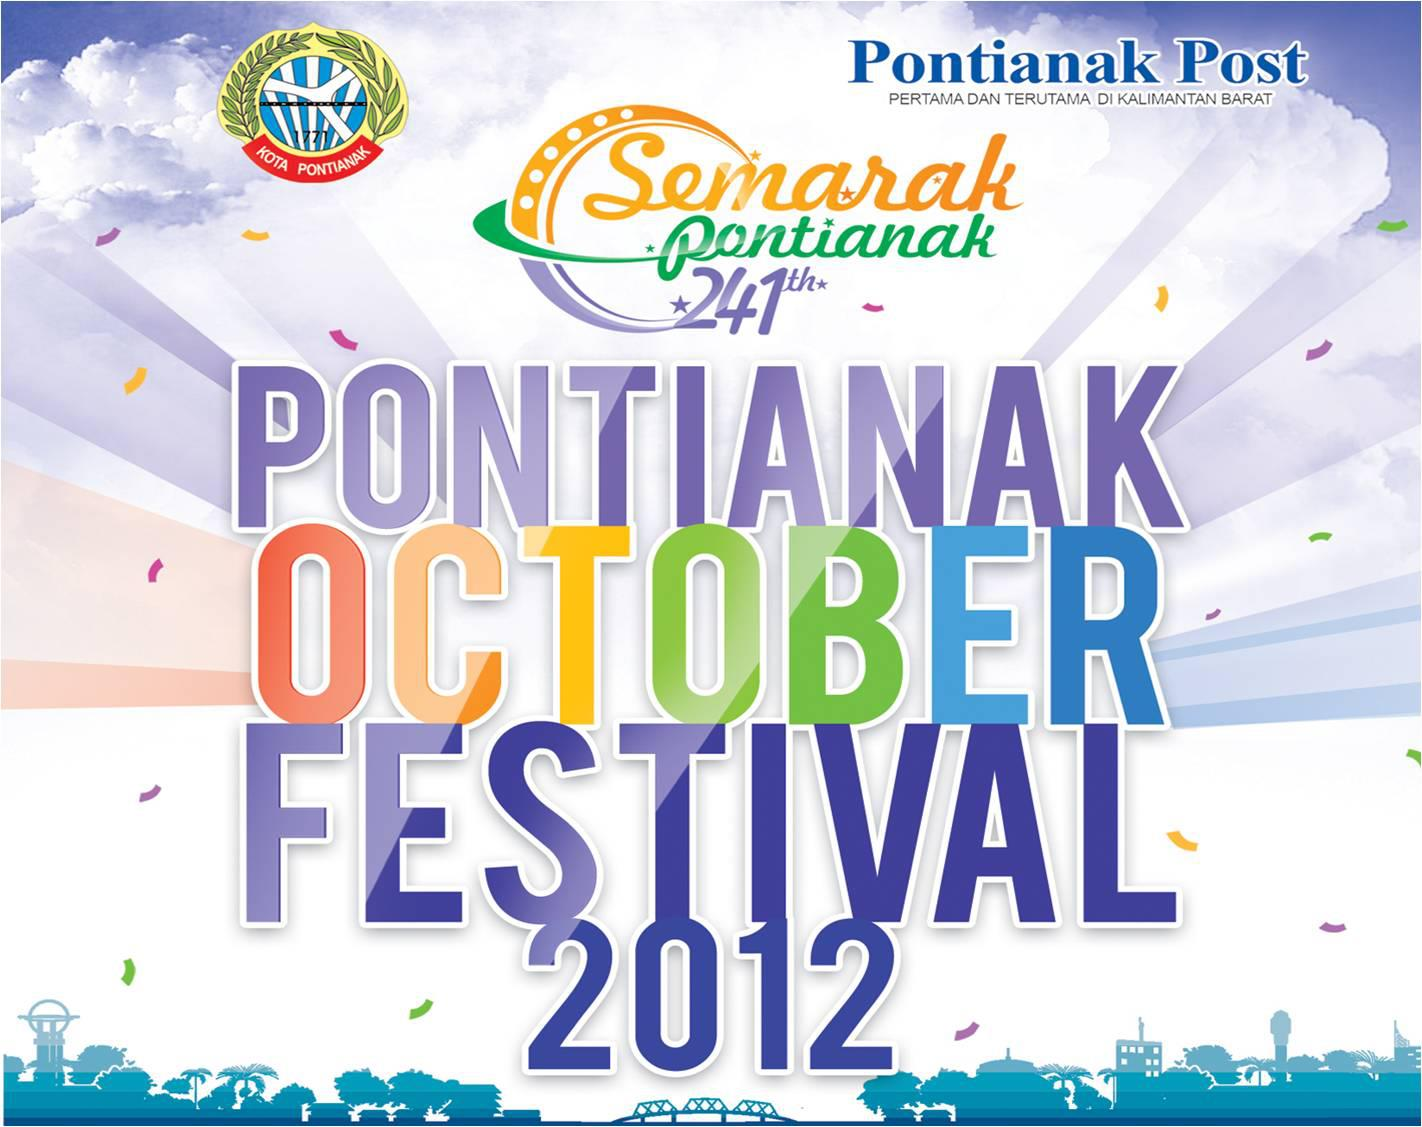 Pontianak October Festival 2012